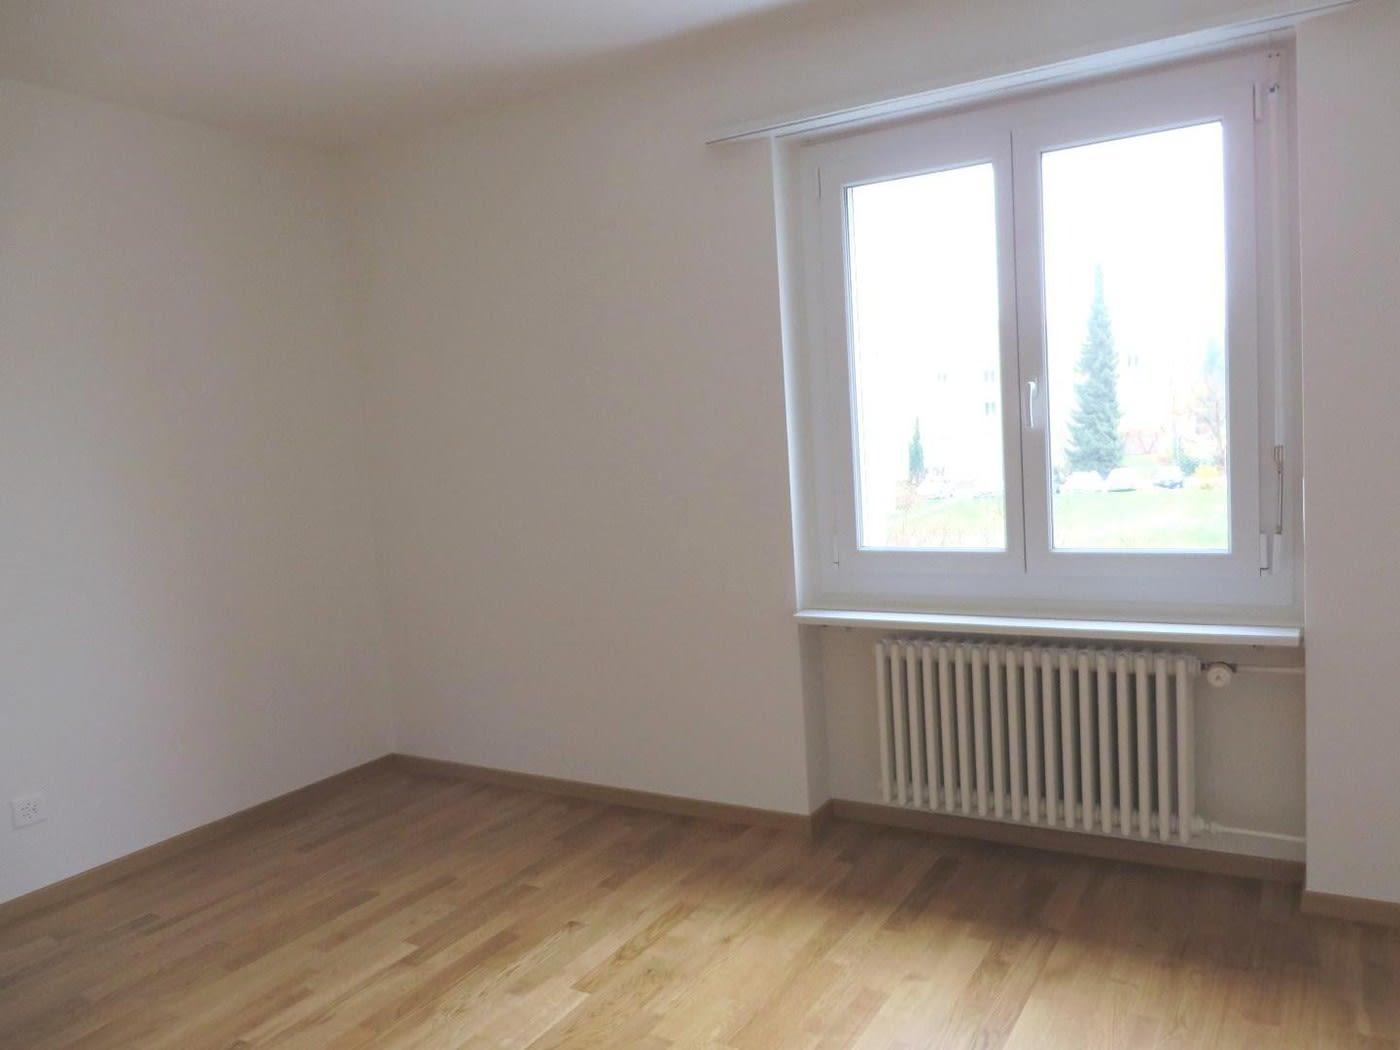 Waldhofstrasse 24